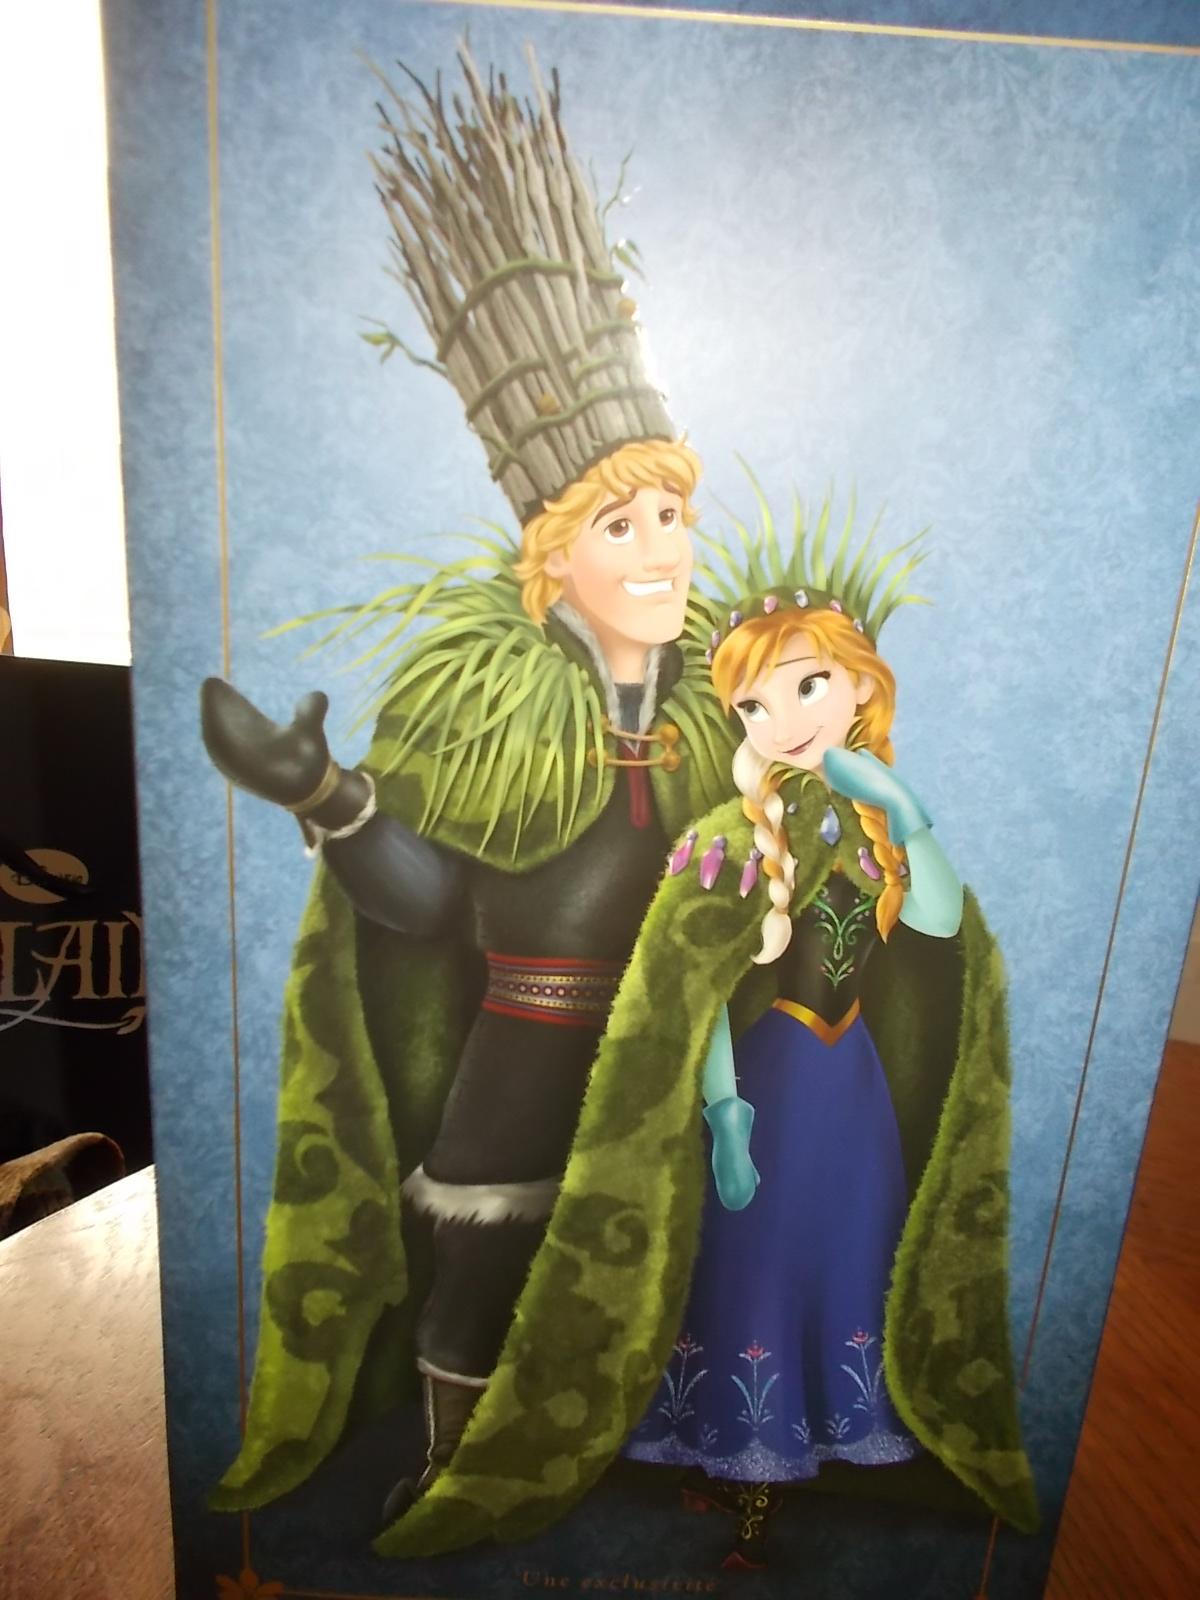 Disney Fairytale Designer Collection (depuis 2013) - Page 2 805624DSCN2155